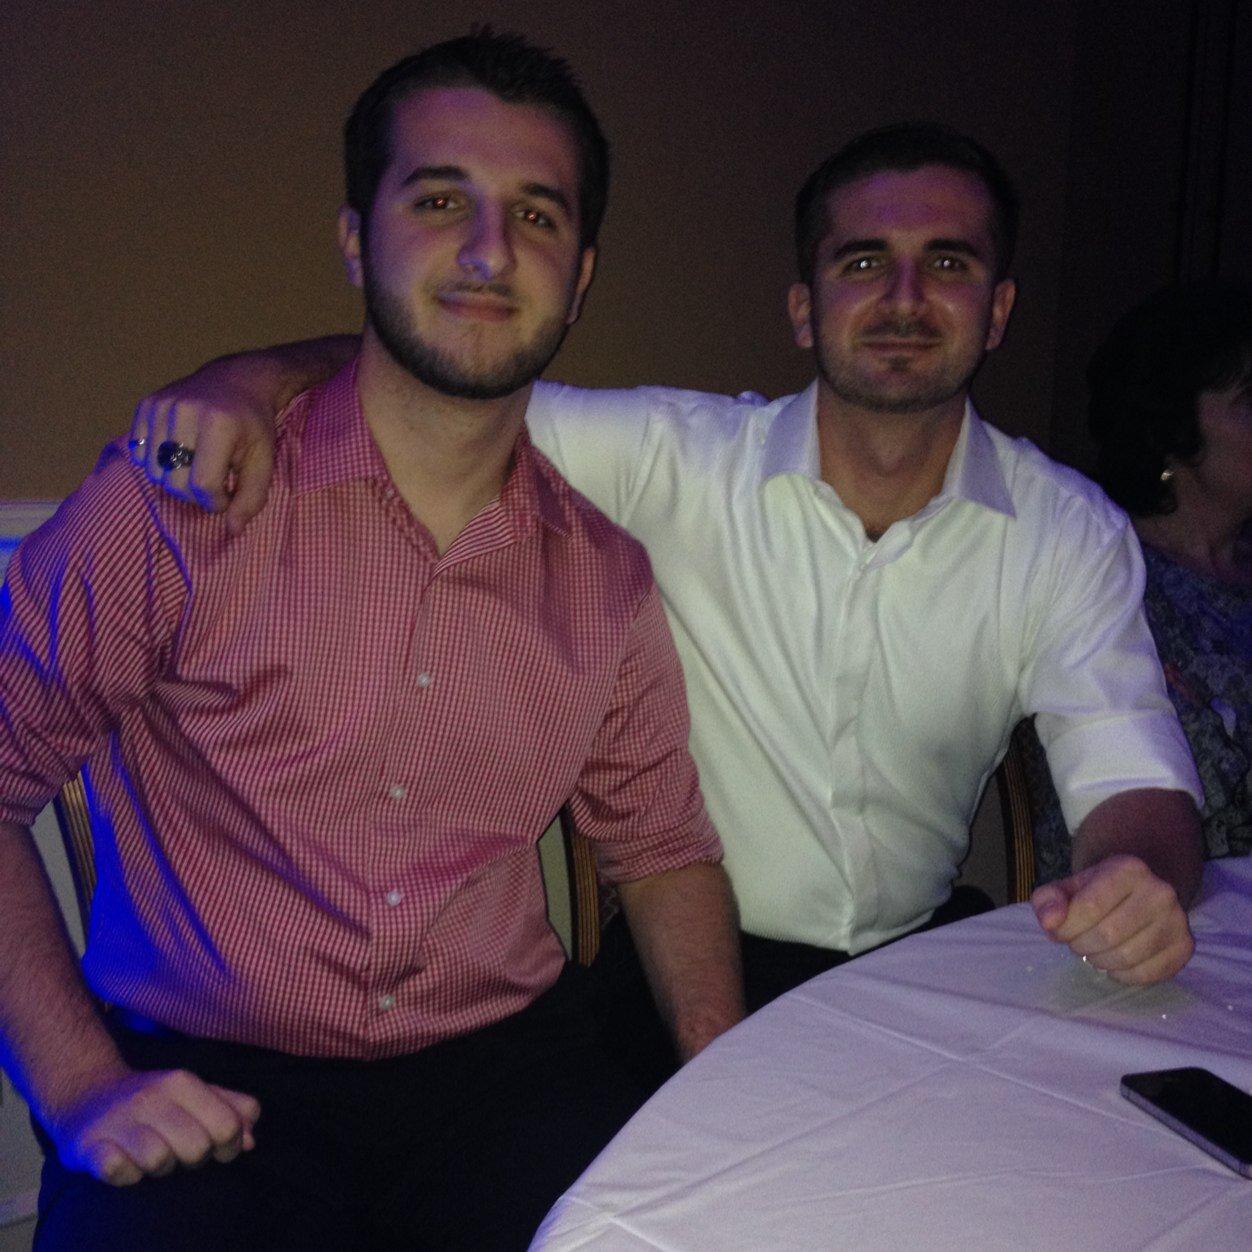 Marko_Duvnjak